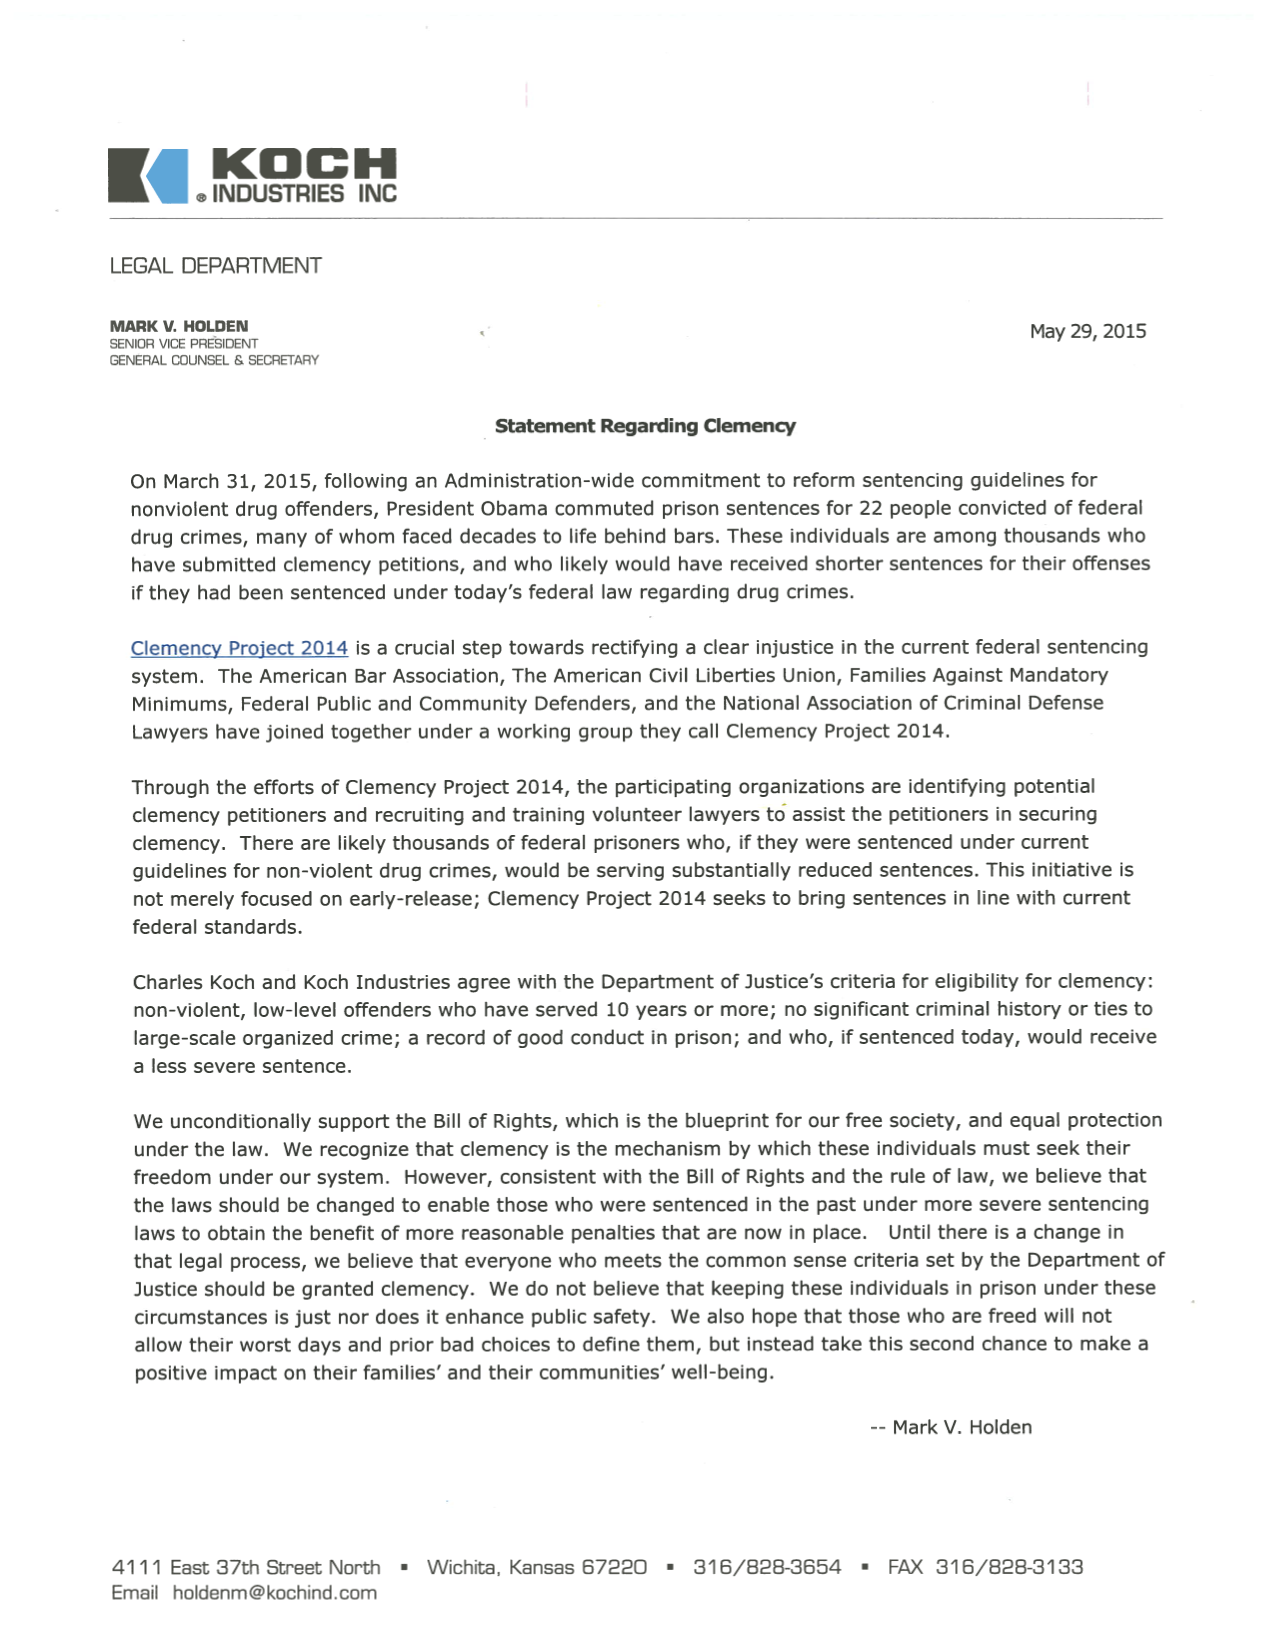 Public health personal statement epidemiology. The Public